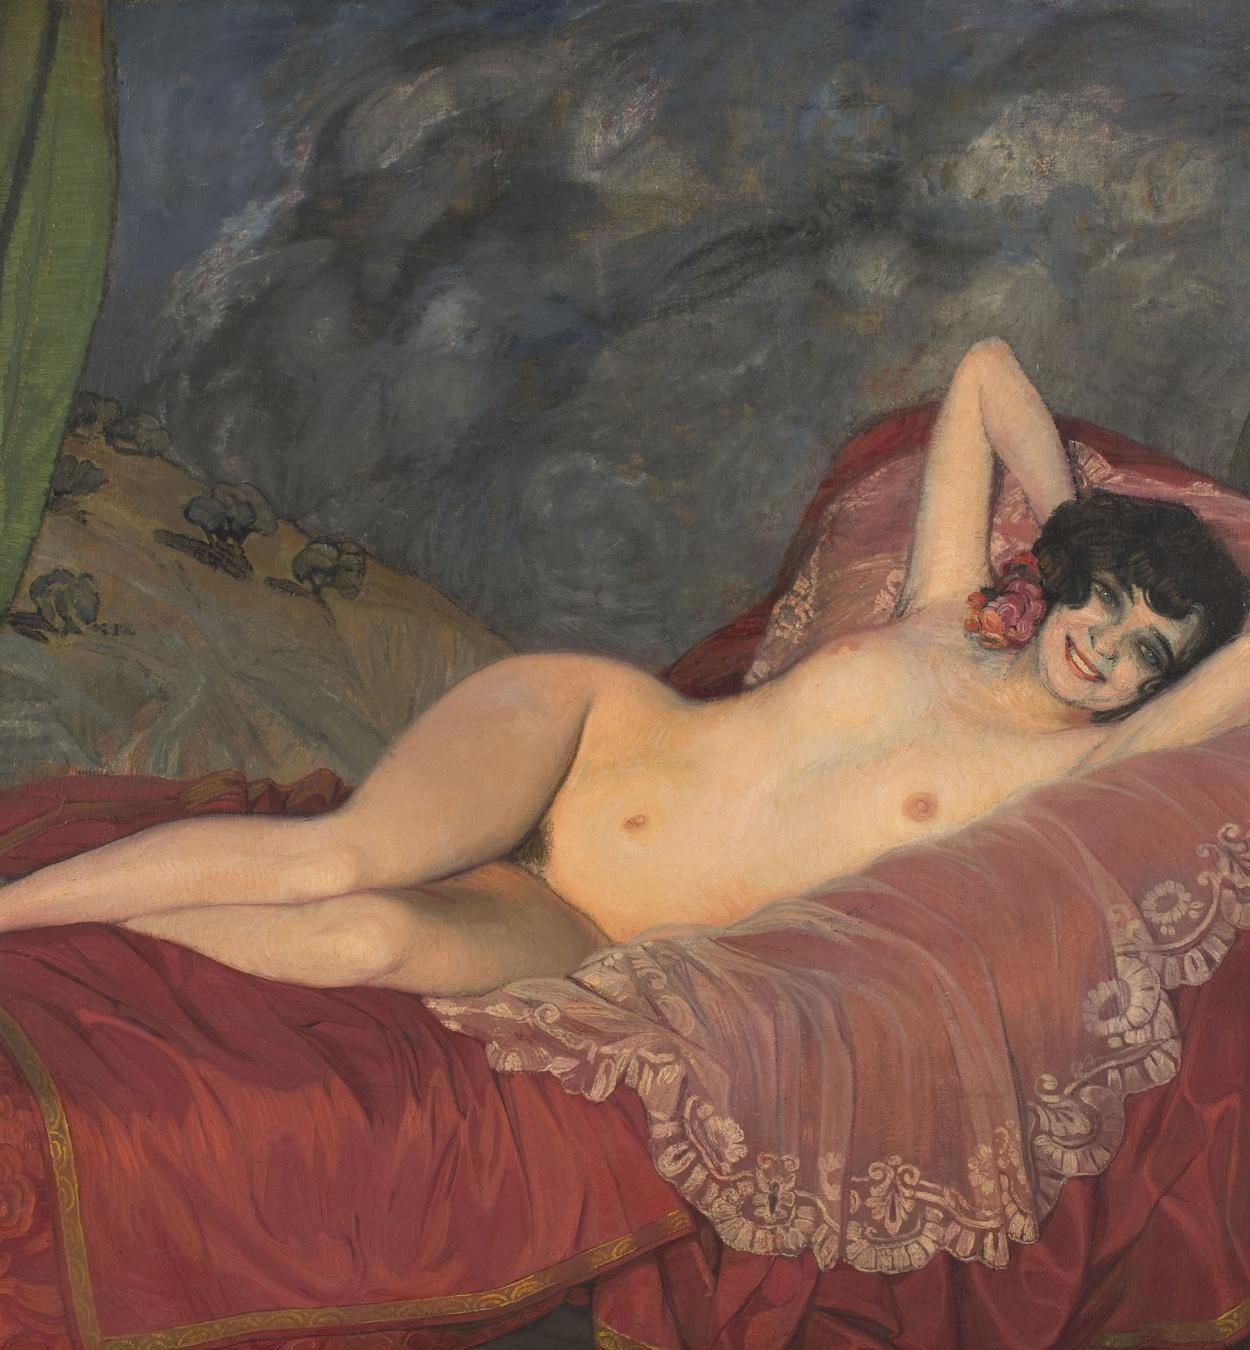 Ignacio Zuloaga - Red Nude - Circa 1922